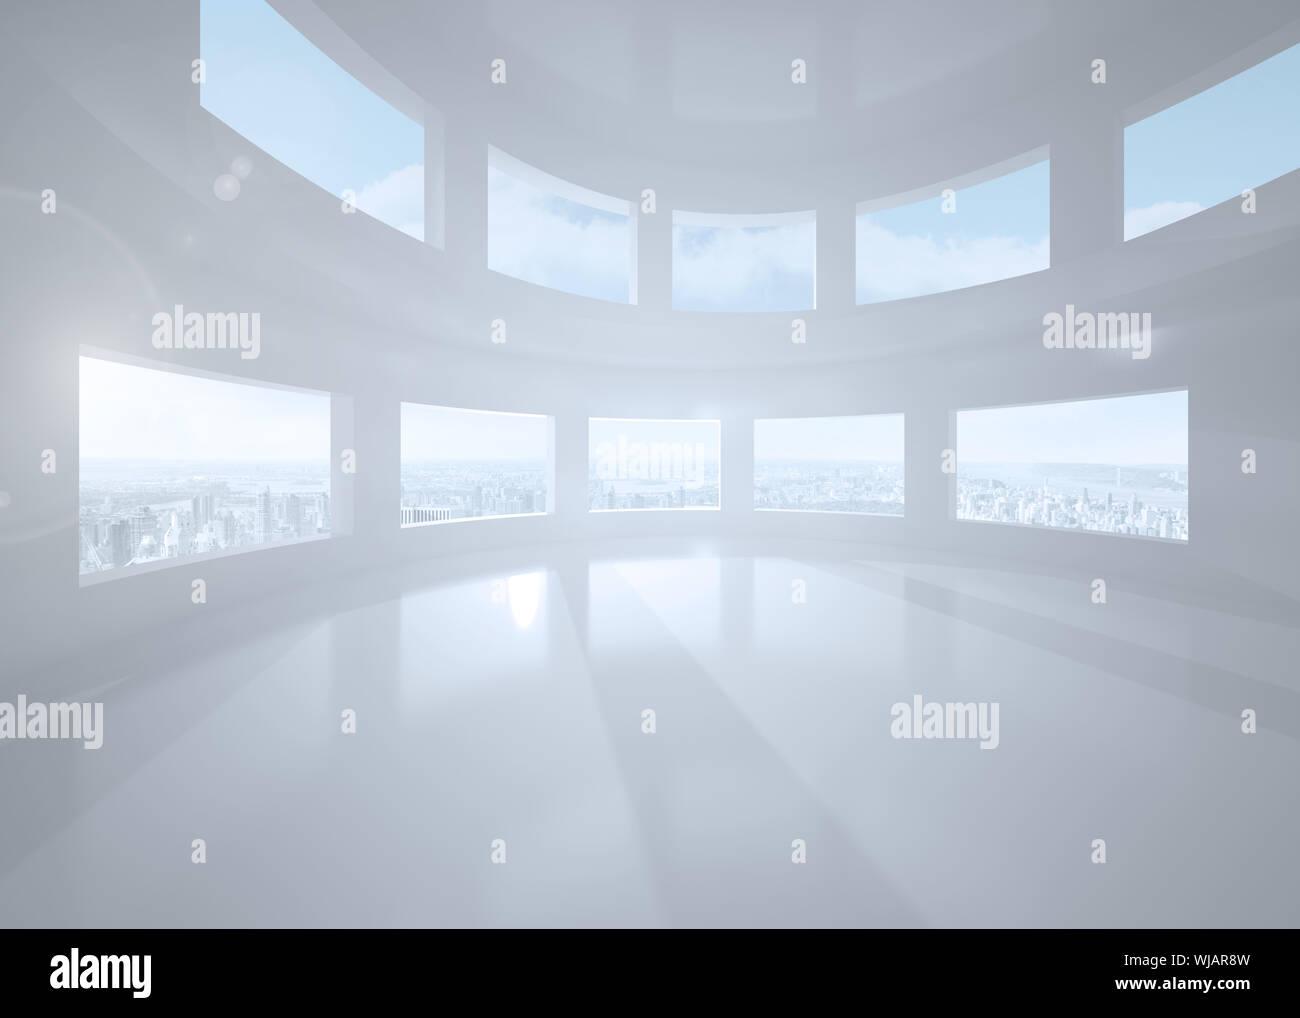 Bright white room with windows Stock Photo